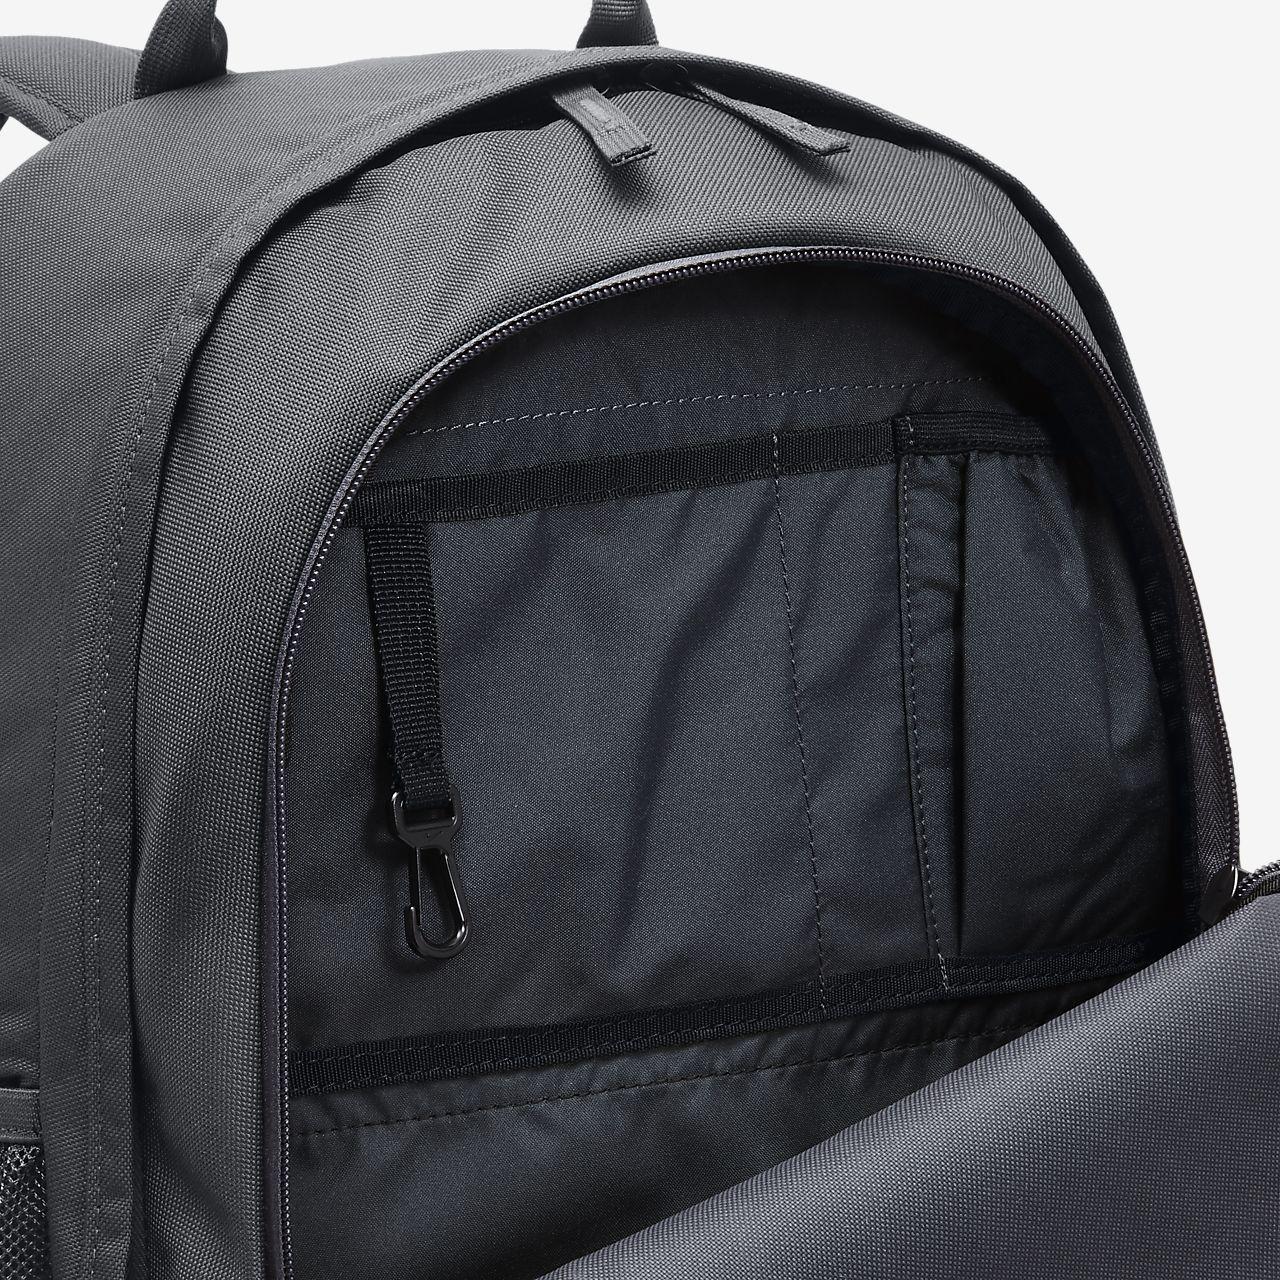 202a784b8d Nike Sportswear Hayward Futura 2.0 Backpack. Nike.com NZ